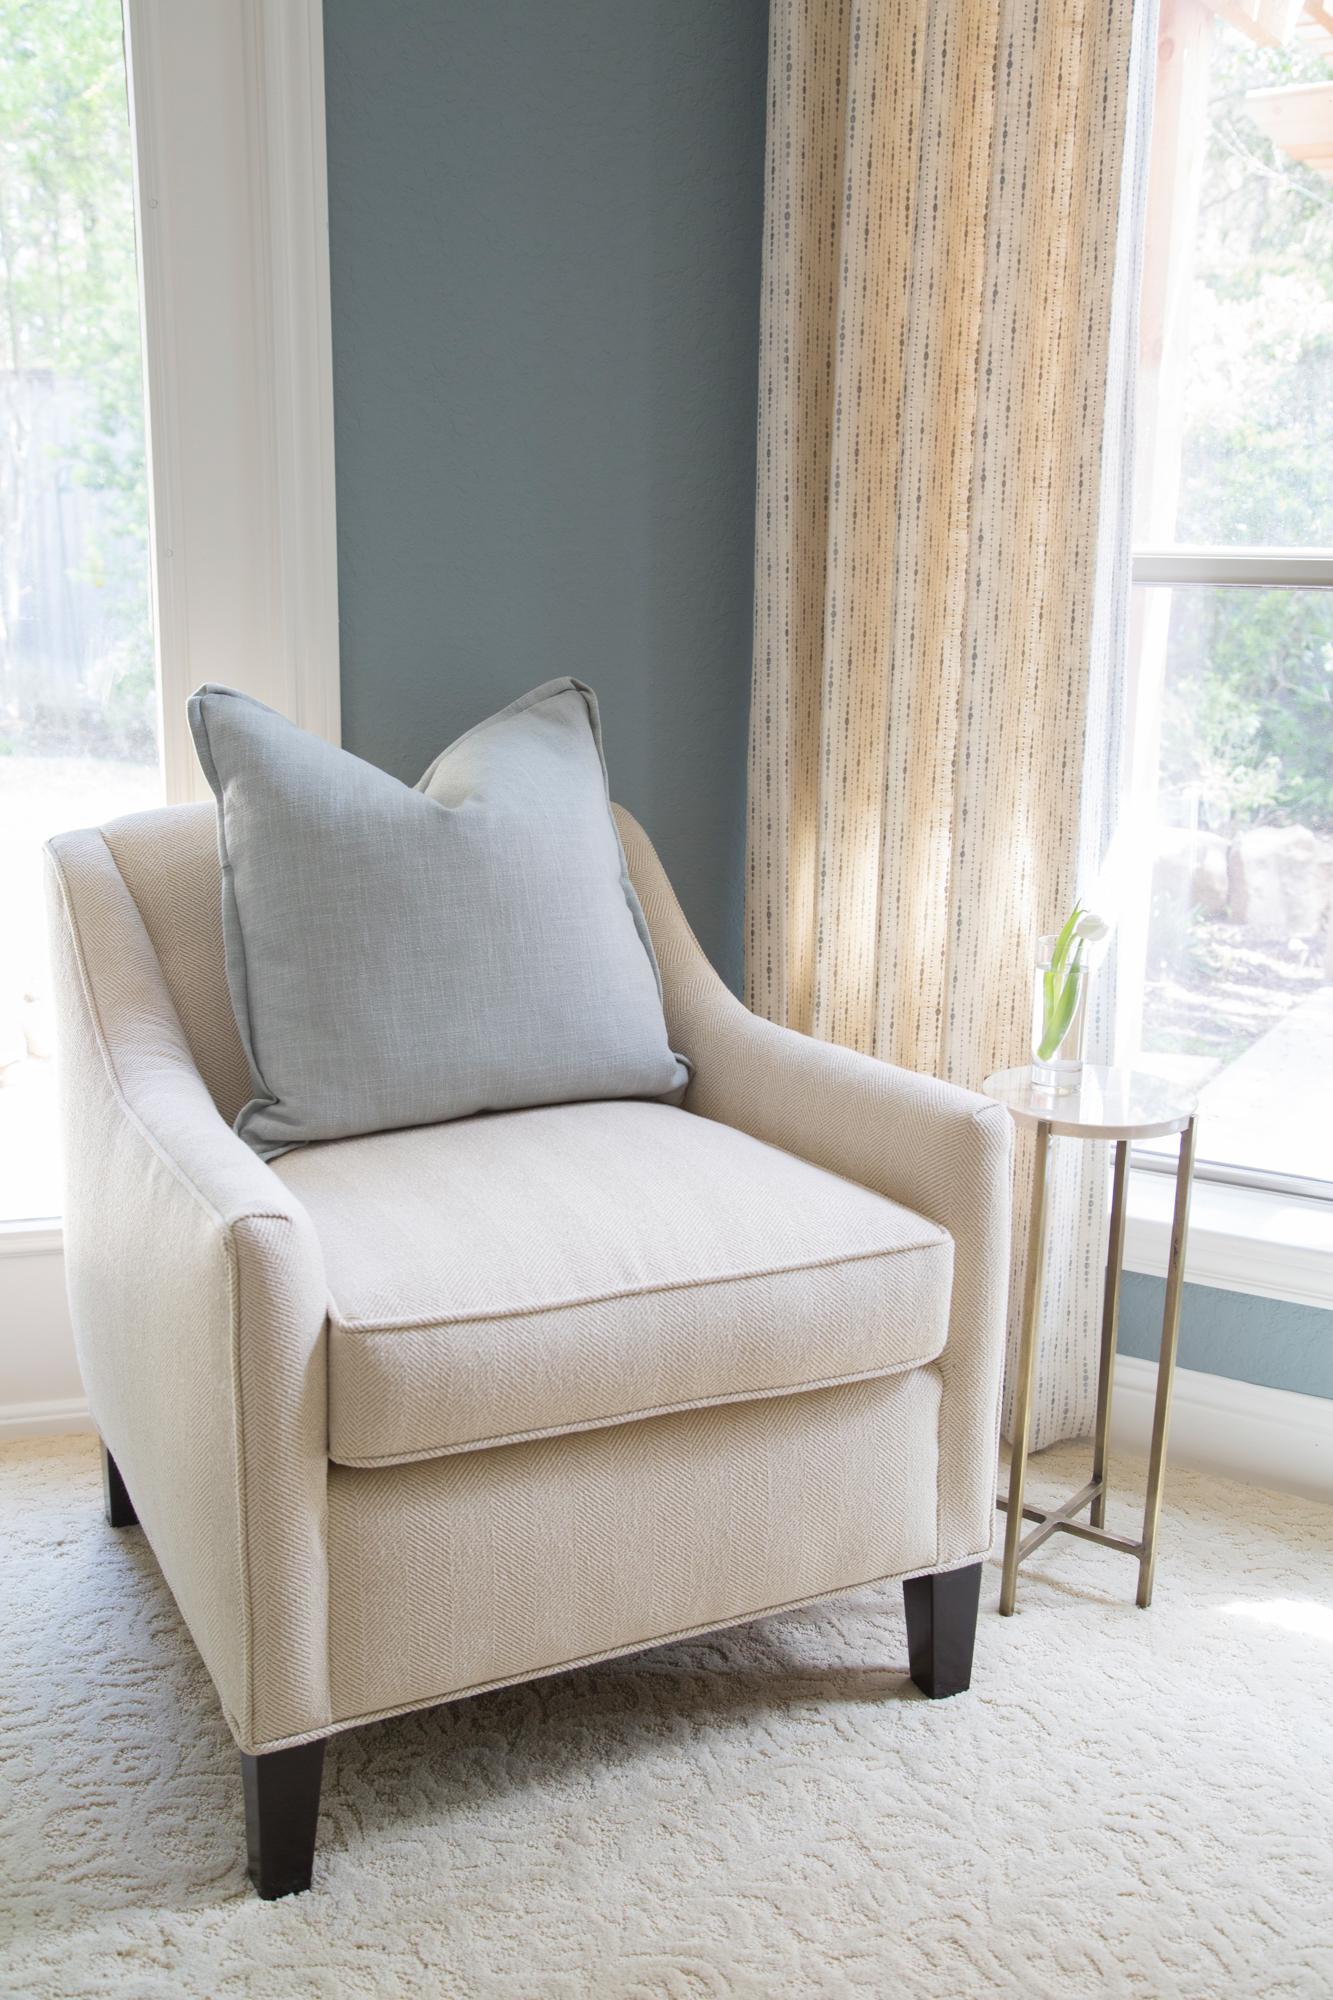 Master Bedroom Redo - Seating, side table, drapery, Designer: Carla Aston